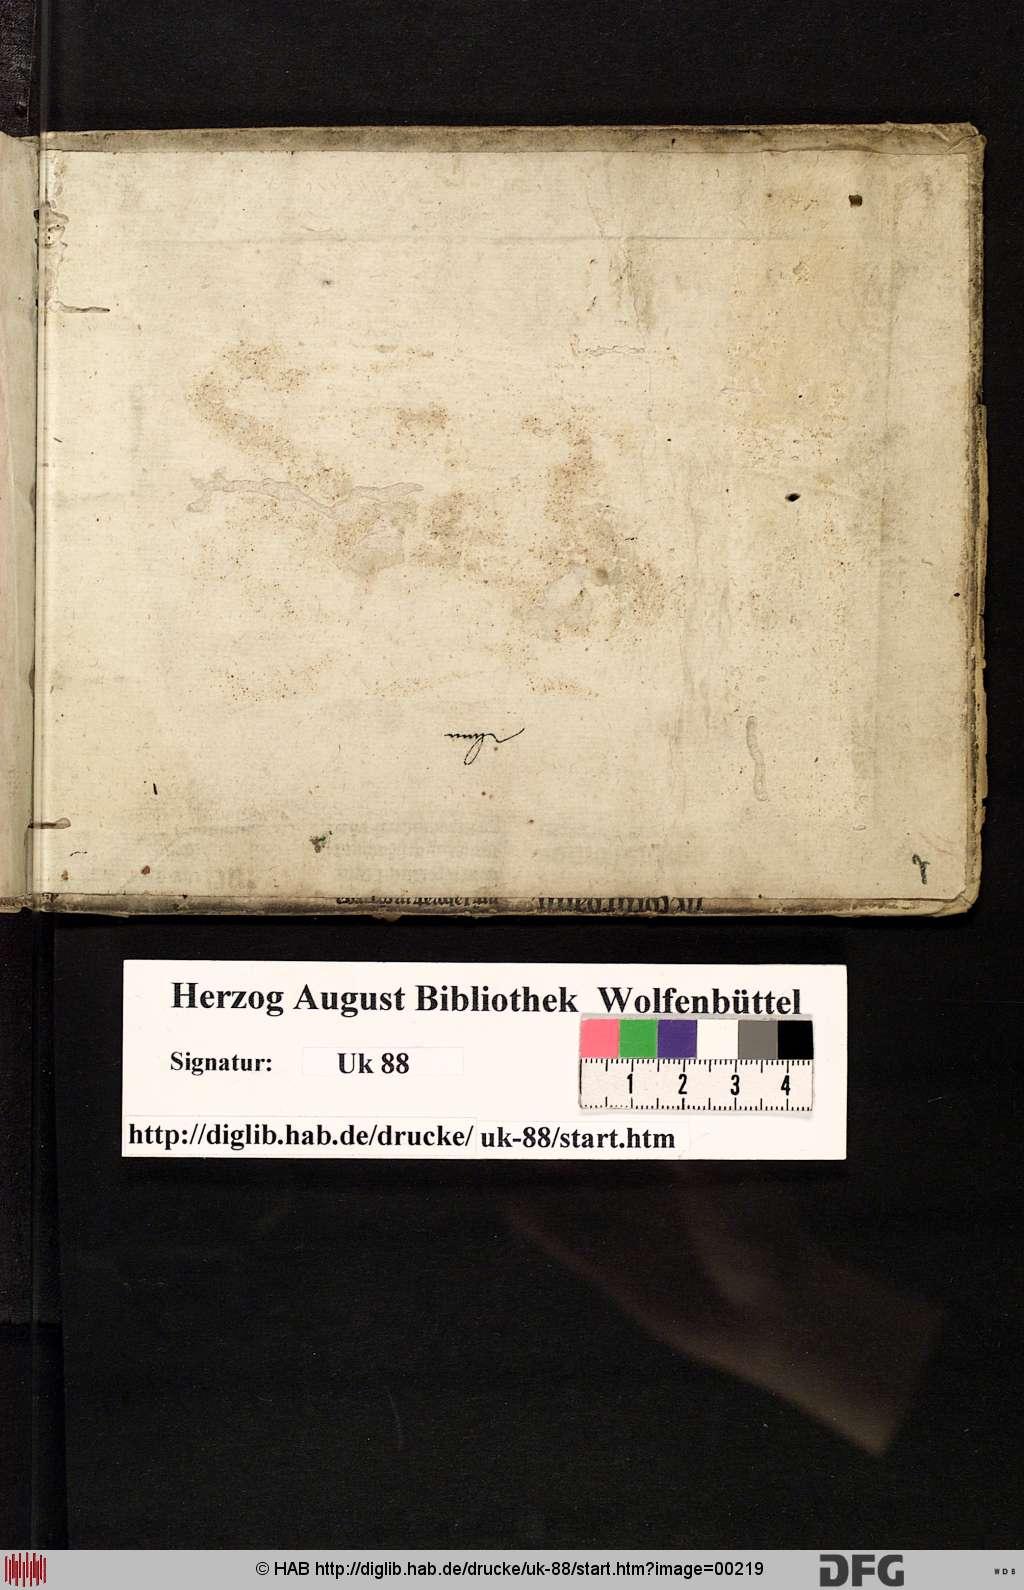 http://diglib.hab.de/drucke/uk-88/00219.jpg